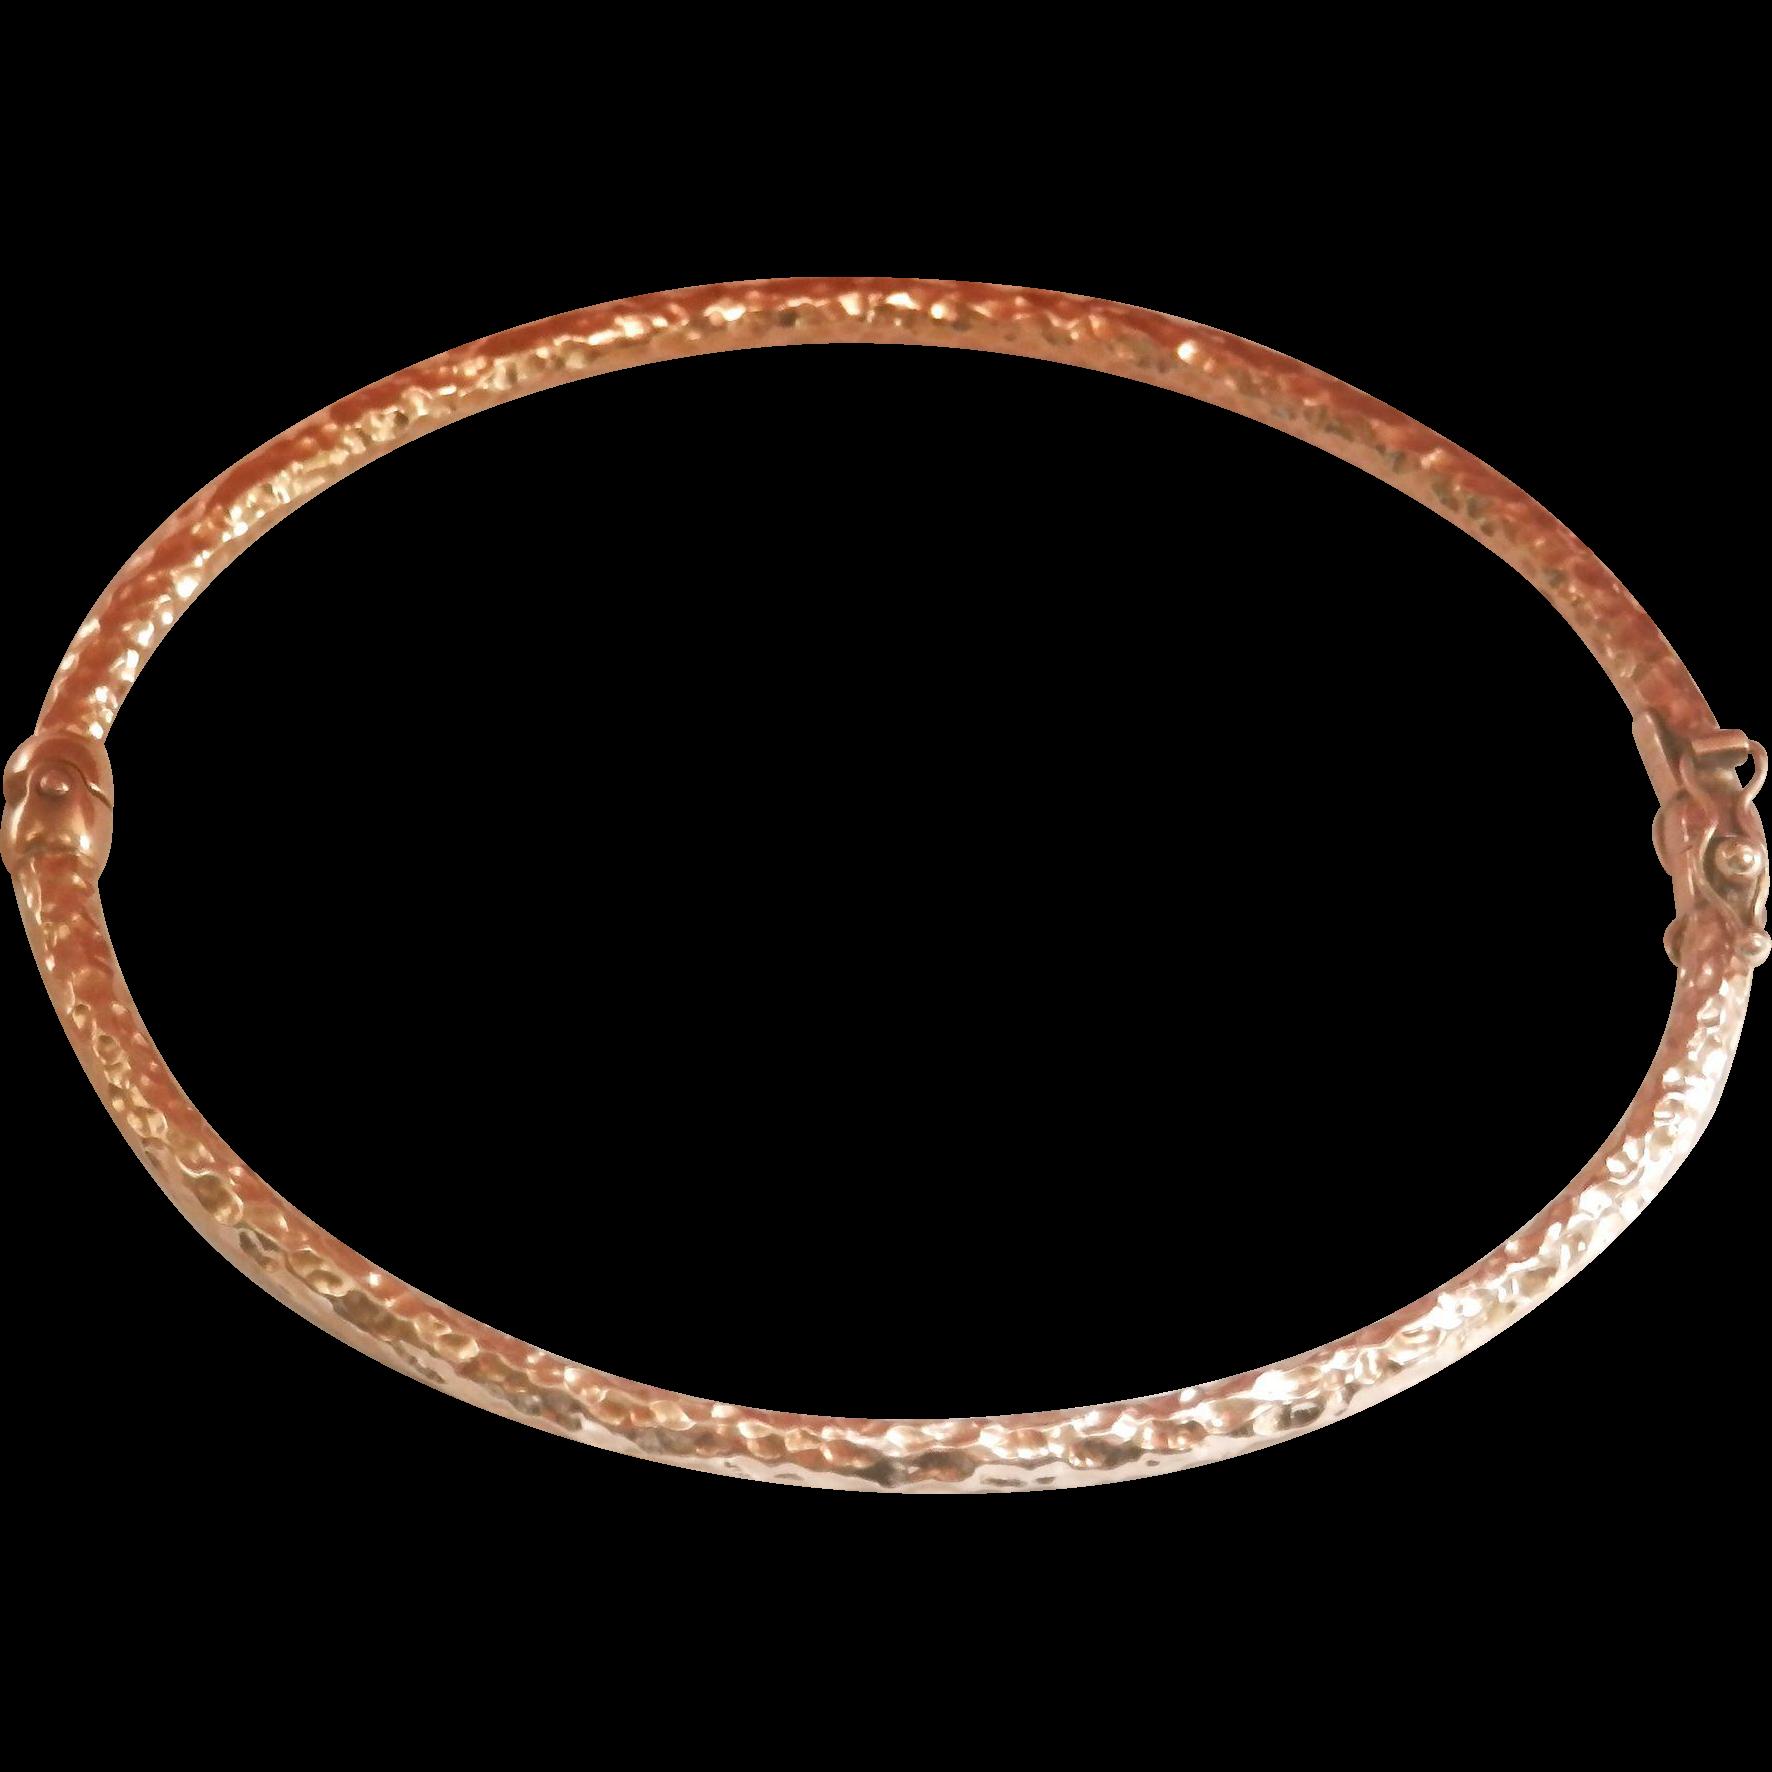 Lovely Textured 9K Y/Gold Hinged Bracelet Bangle